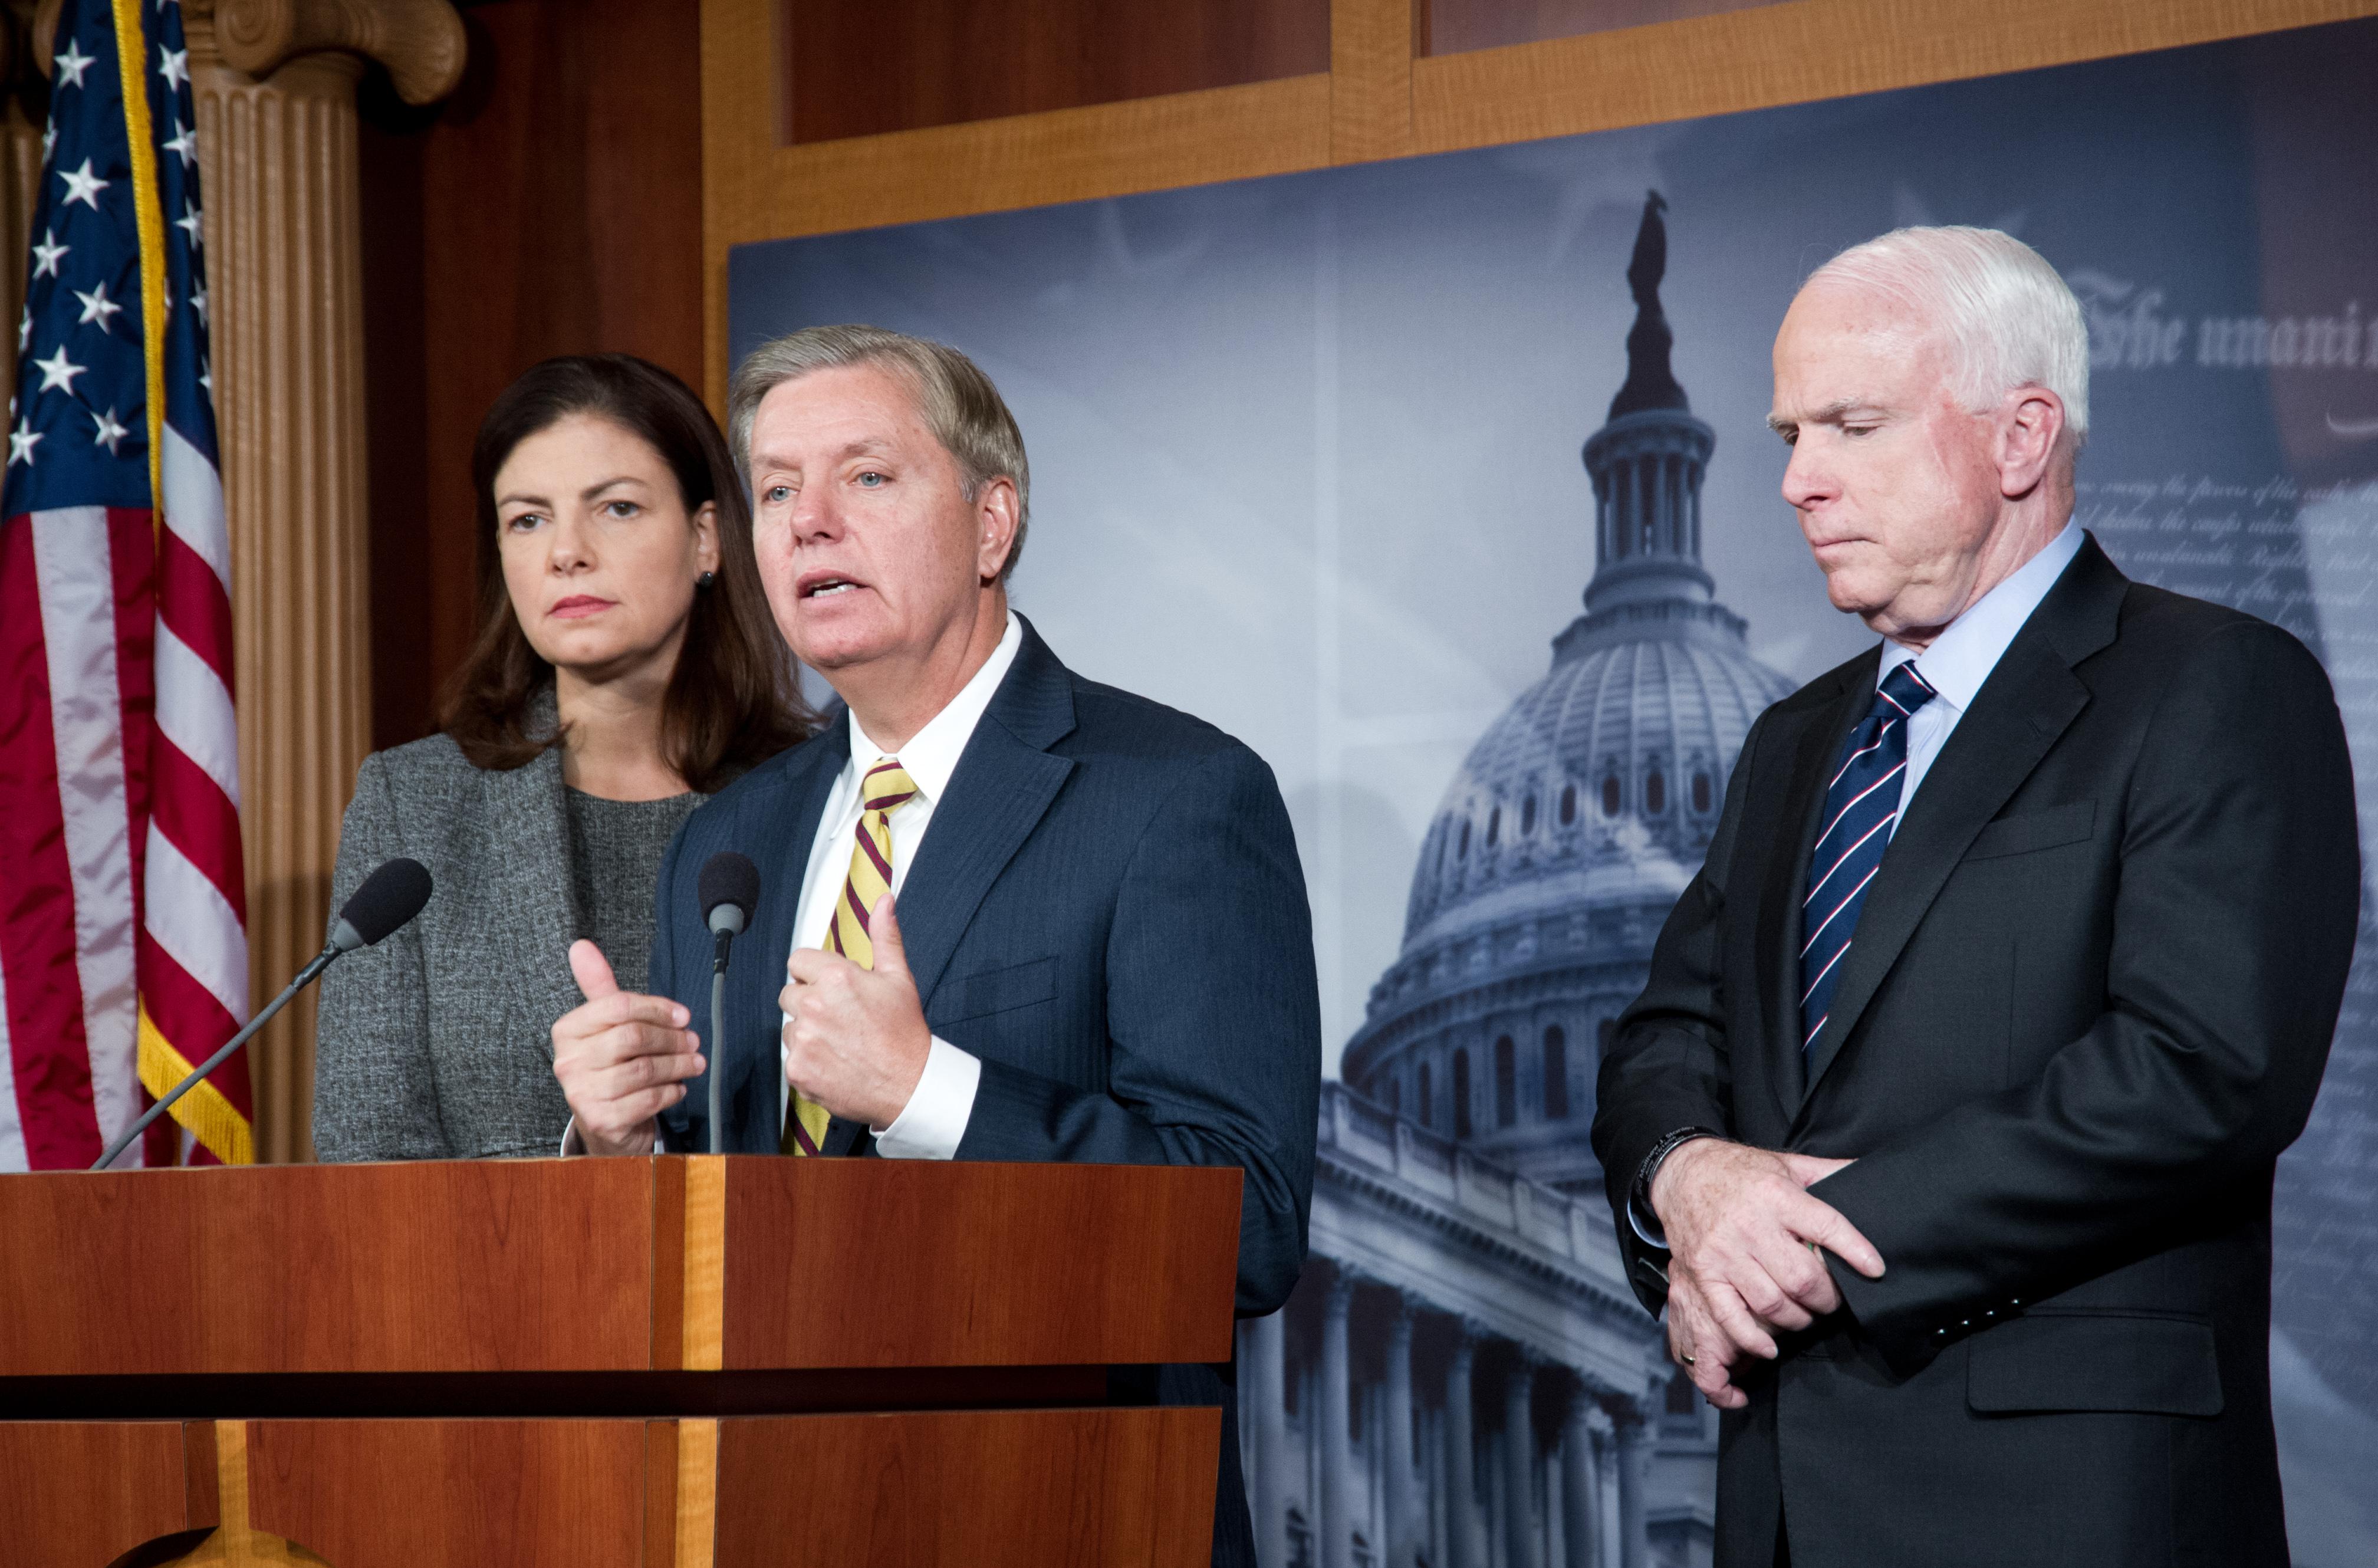 Late US Senator John McCain(R) (R-AZ), Lindsey Graham(c) (R-SC), and Kelly Ayotte (R-NH) during a press conference November 14, 2012 on Capitol Hill in Washington, DC regarding the terrorist attack in Benghazi, Libya on September 11, 2012.